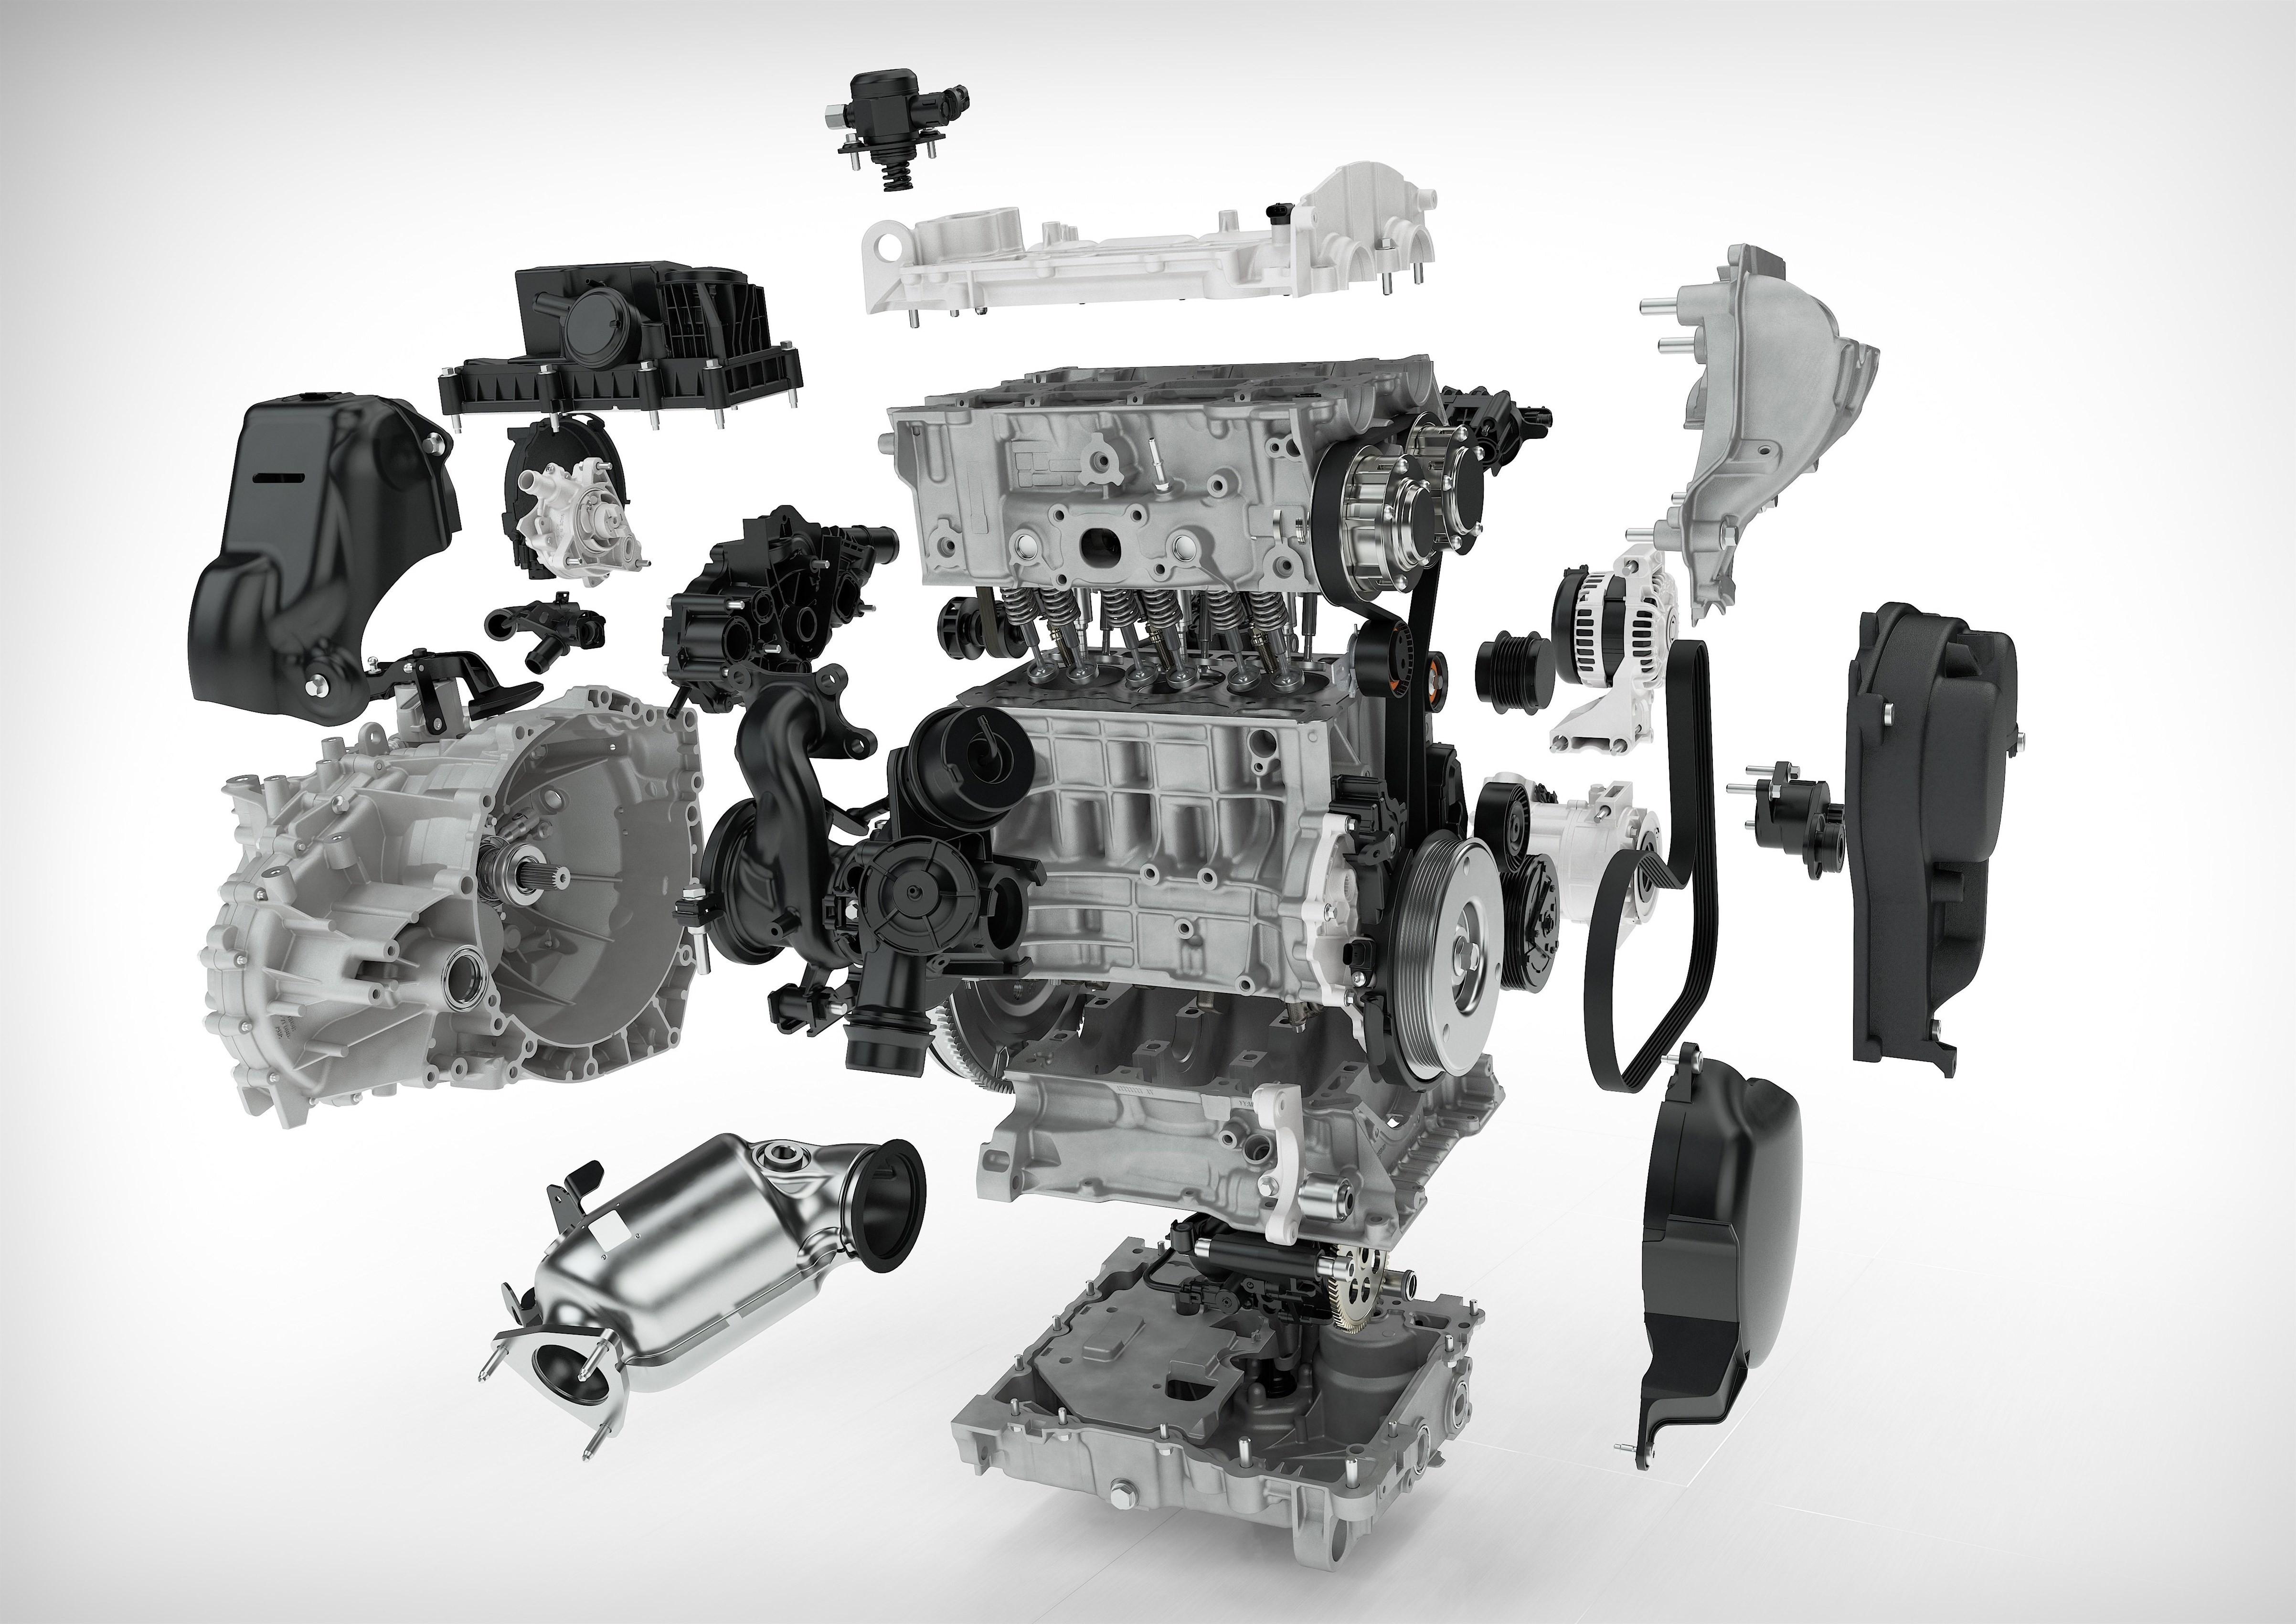 Volvo EVs Incoming Thanks To MEP Platform, 48V Mild Hybrids Also On The Way - autoevolution